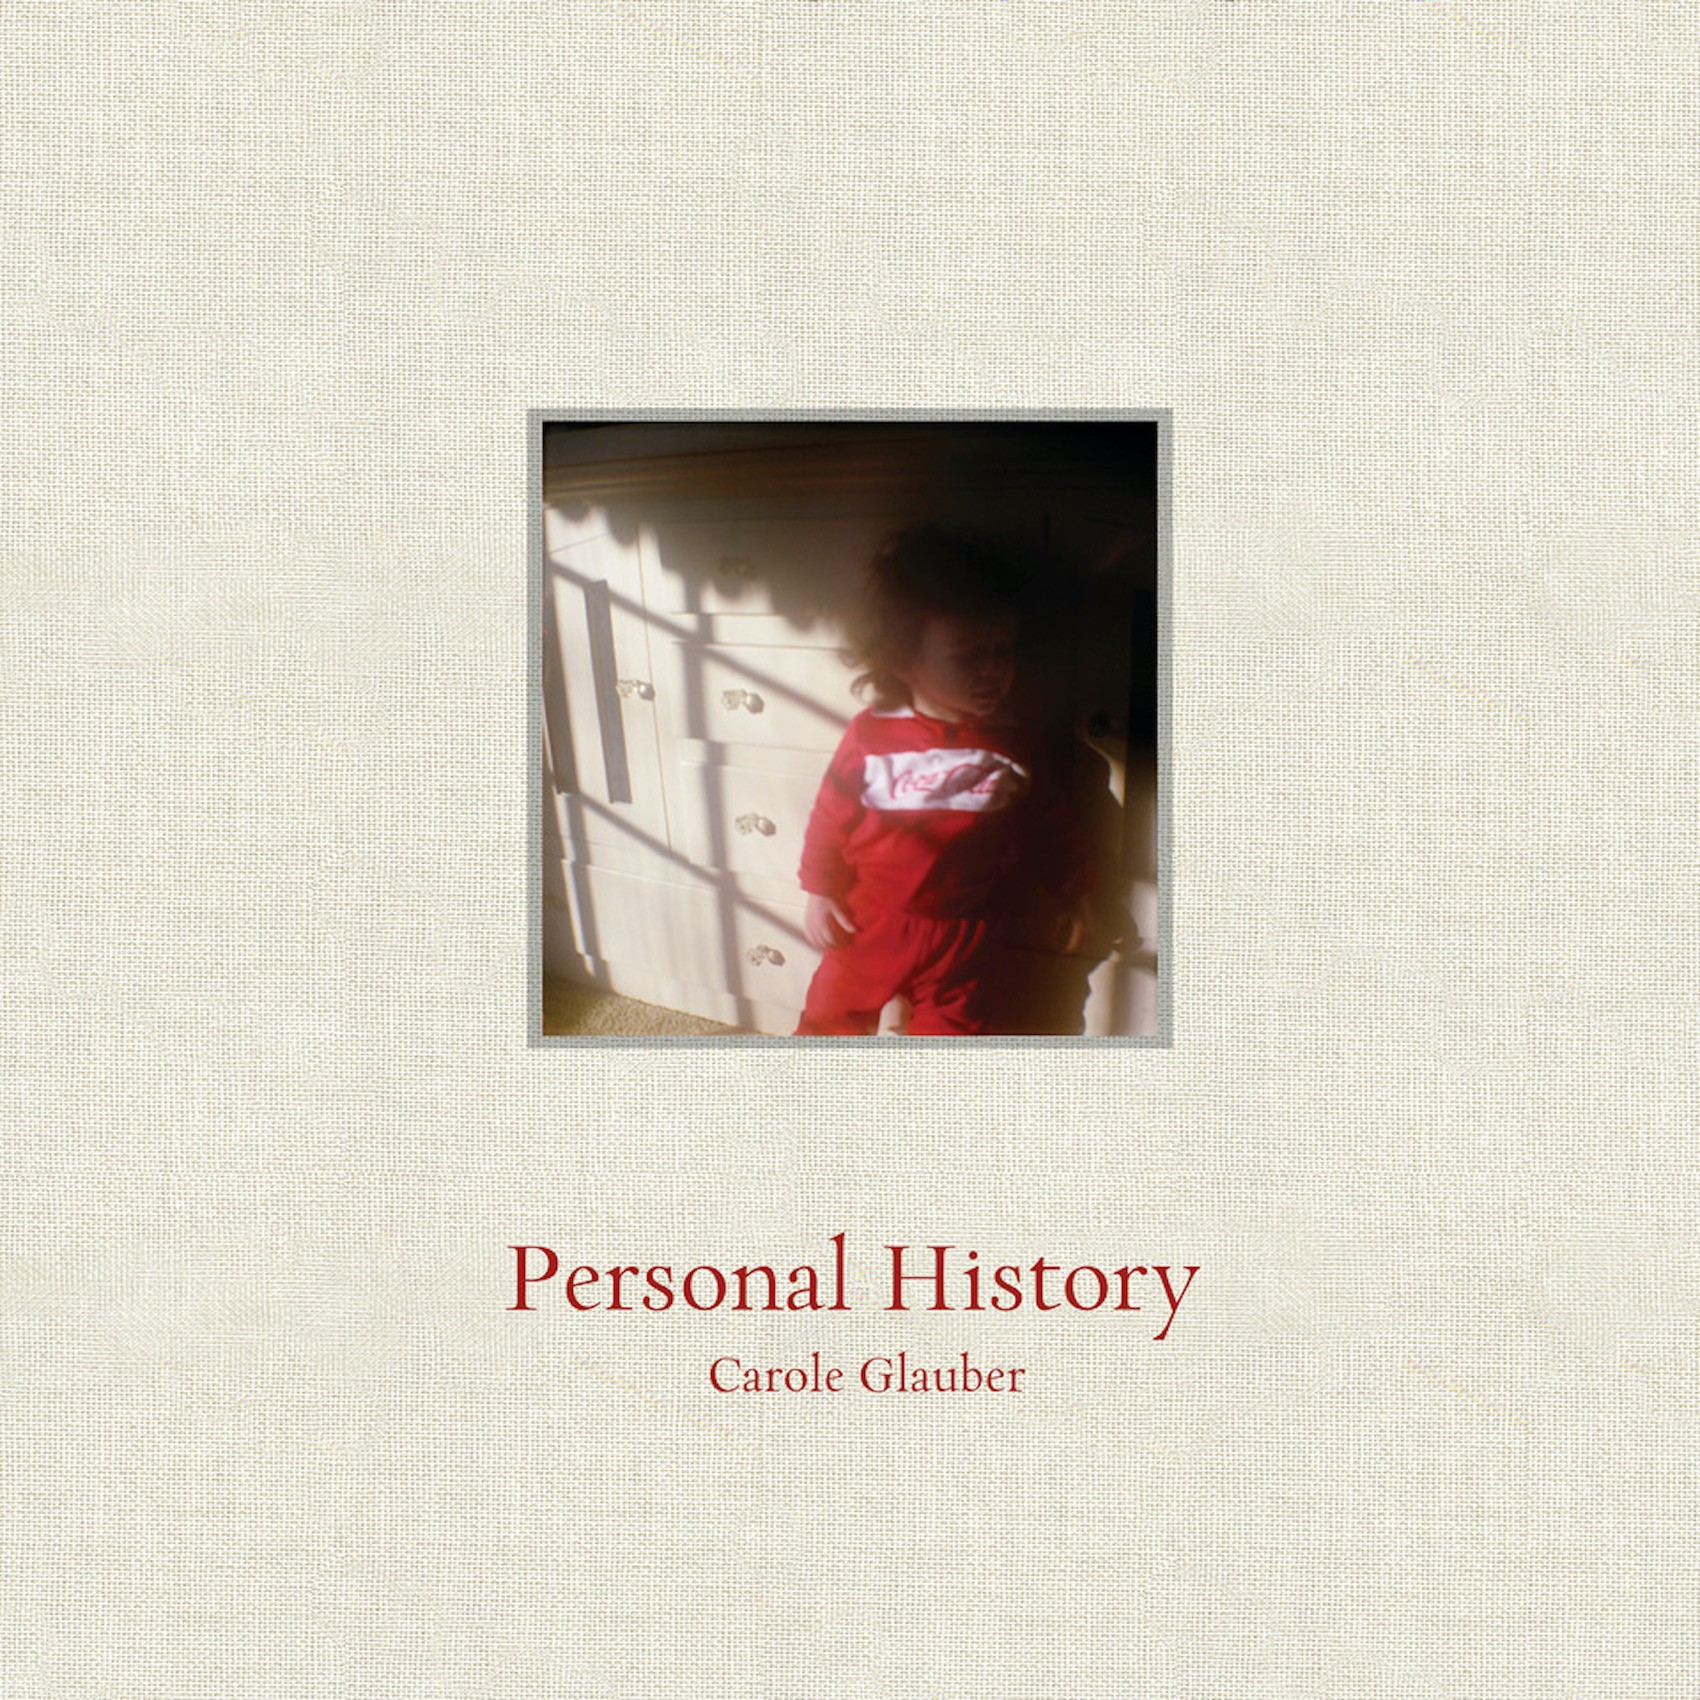 03_Book Cover